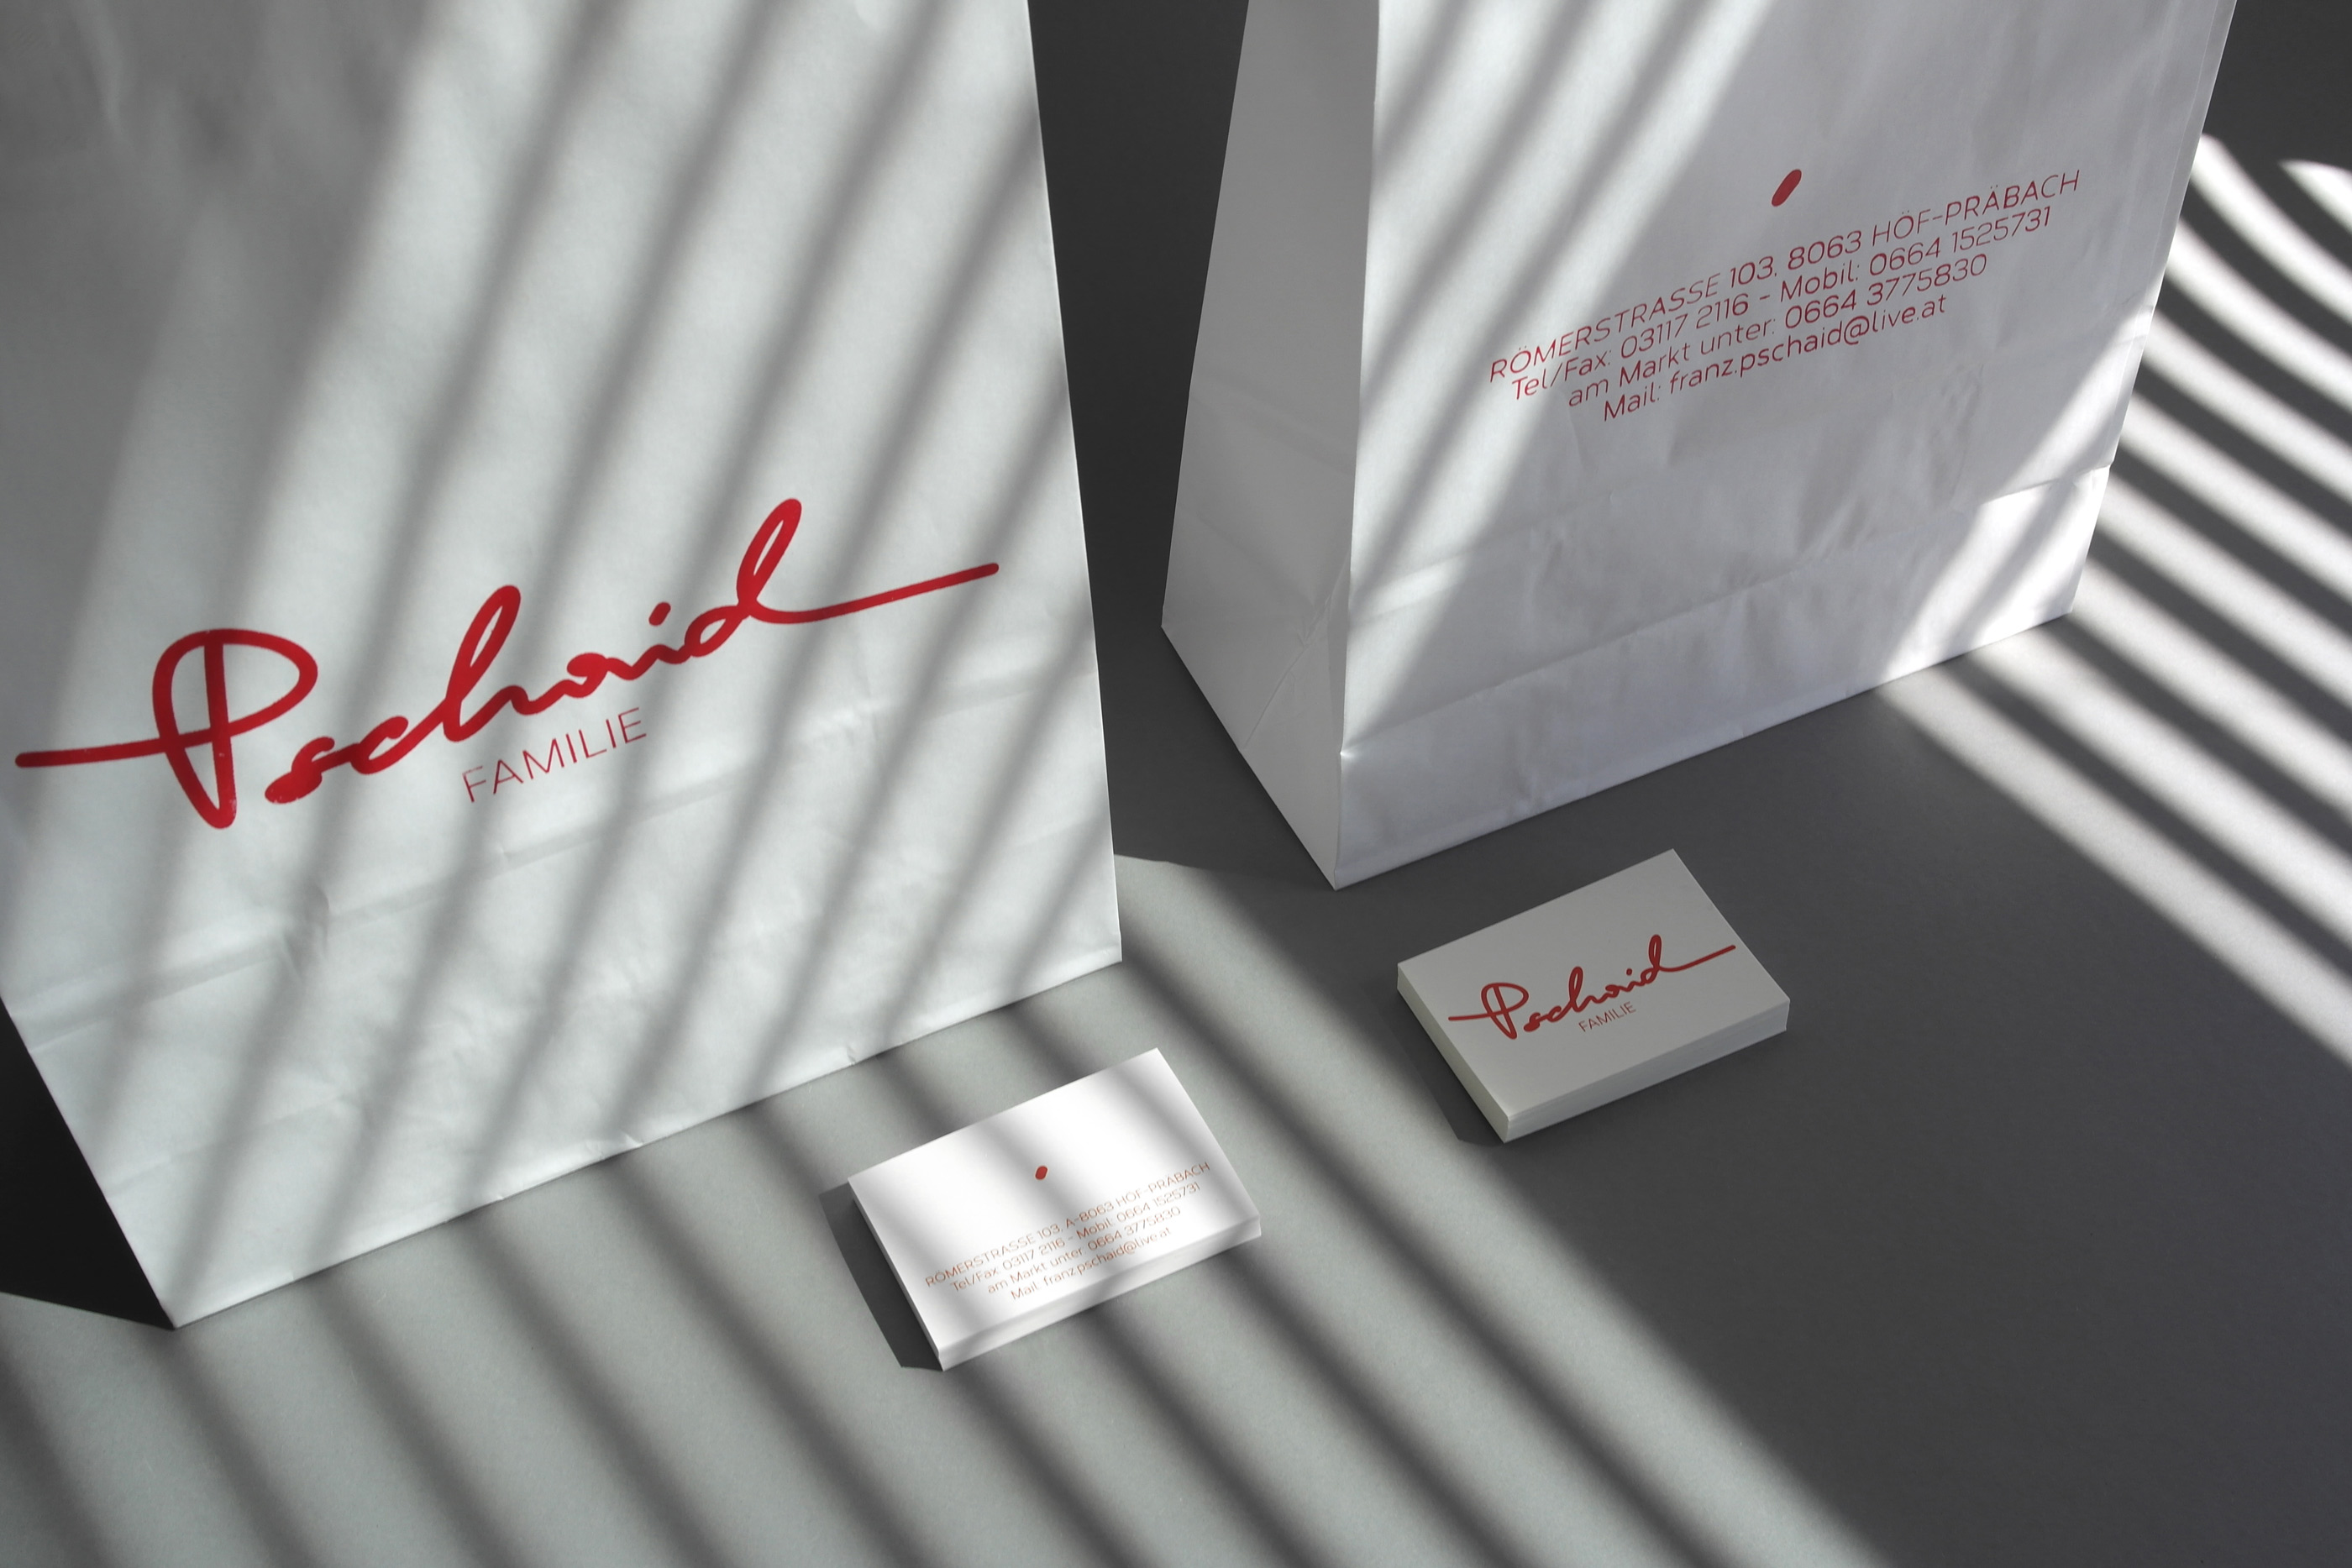 pschaid-02